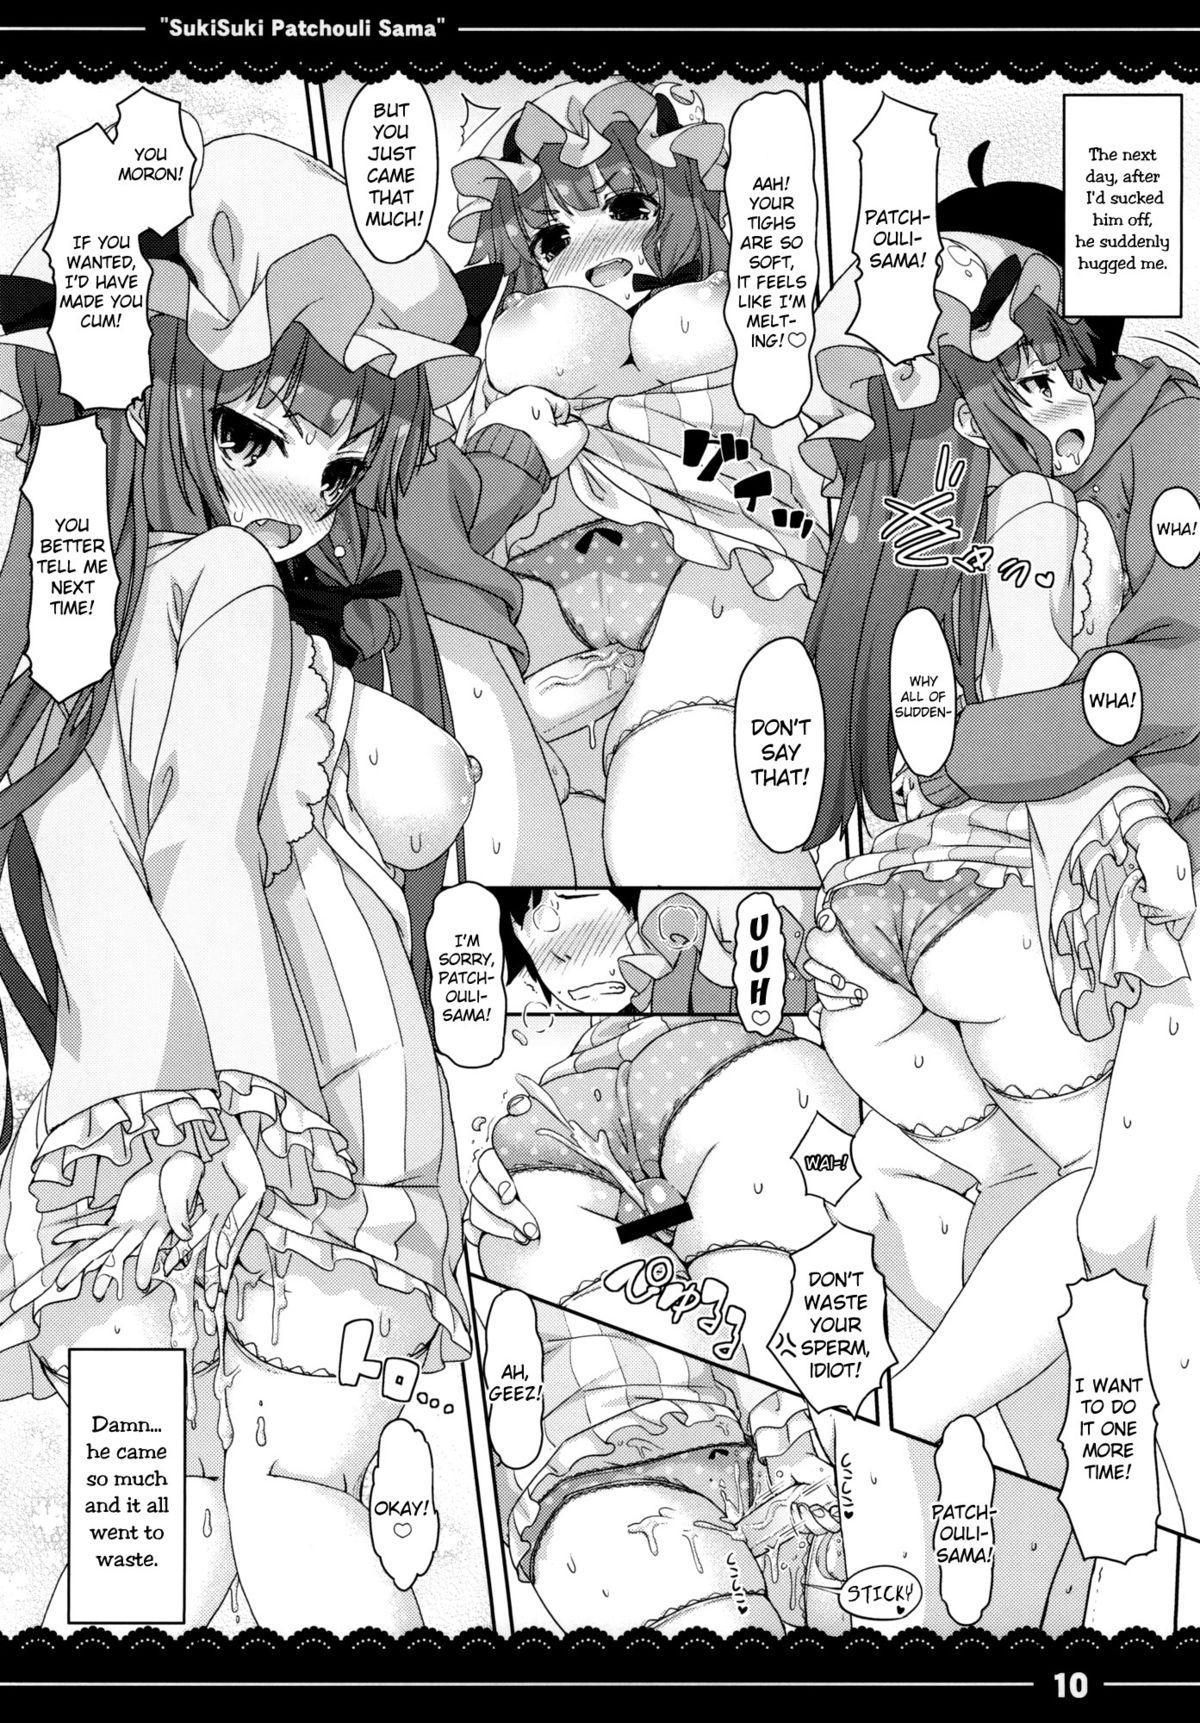 (Reitaisai 10) [Itou Life] Suki Suki! Patchouli-sama | I Really Like You! Patchouli-sama (Touhou Project) [English] {doujin-moe.us} 10